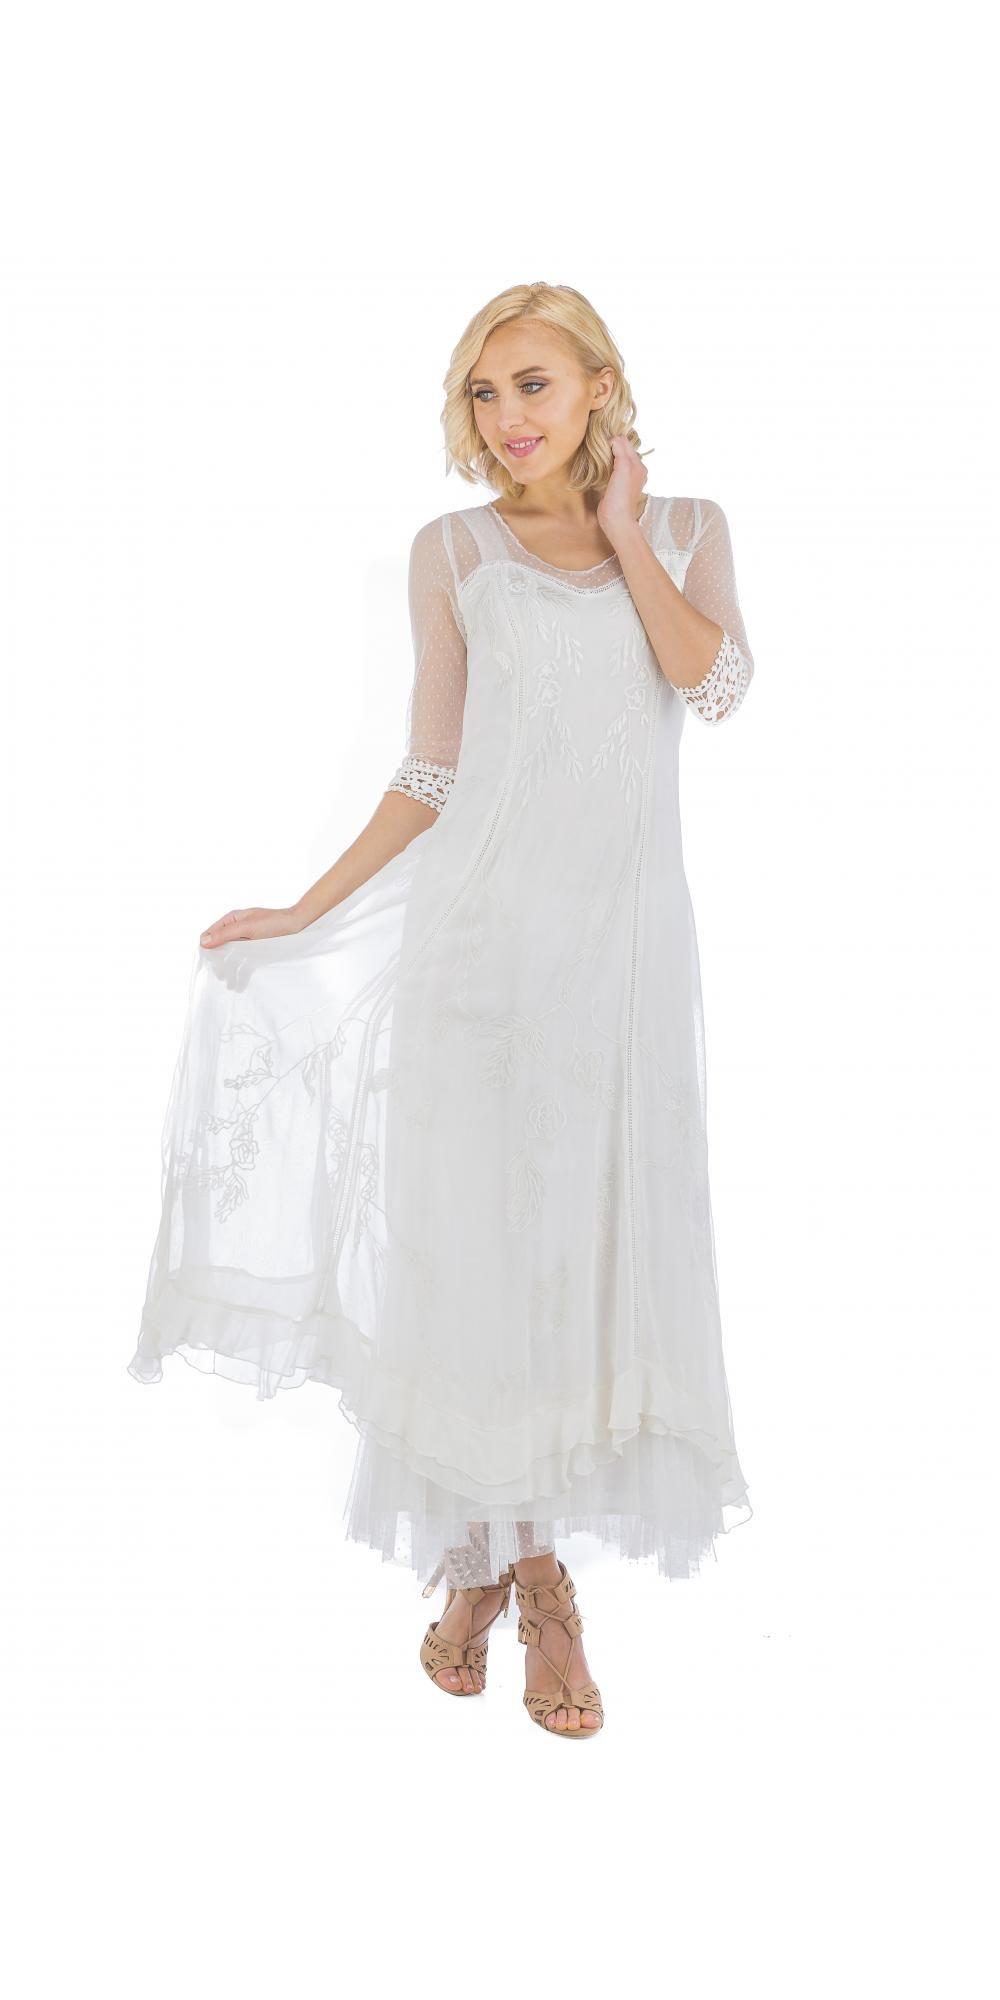 Nataya cl vintage style wedding dress in ivory vintage style